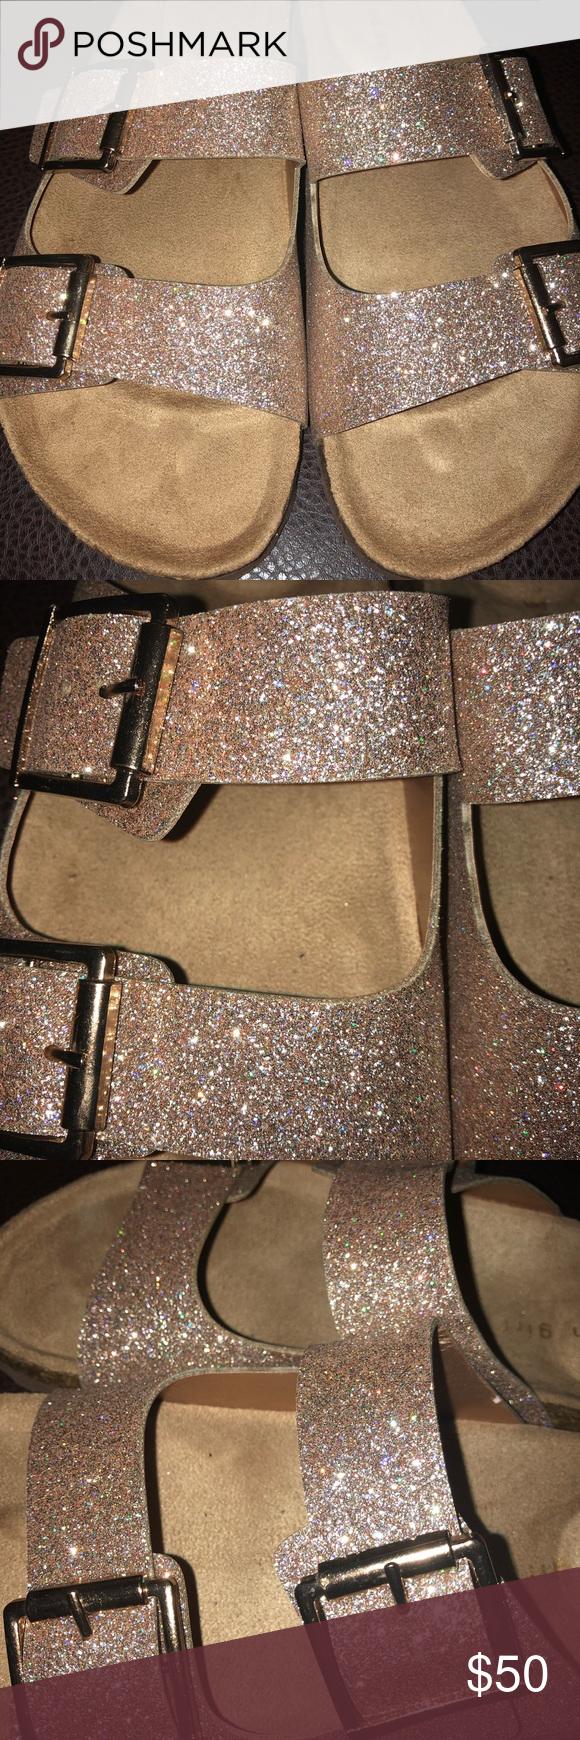 madden girl sparkly birkenstocks